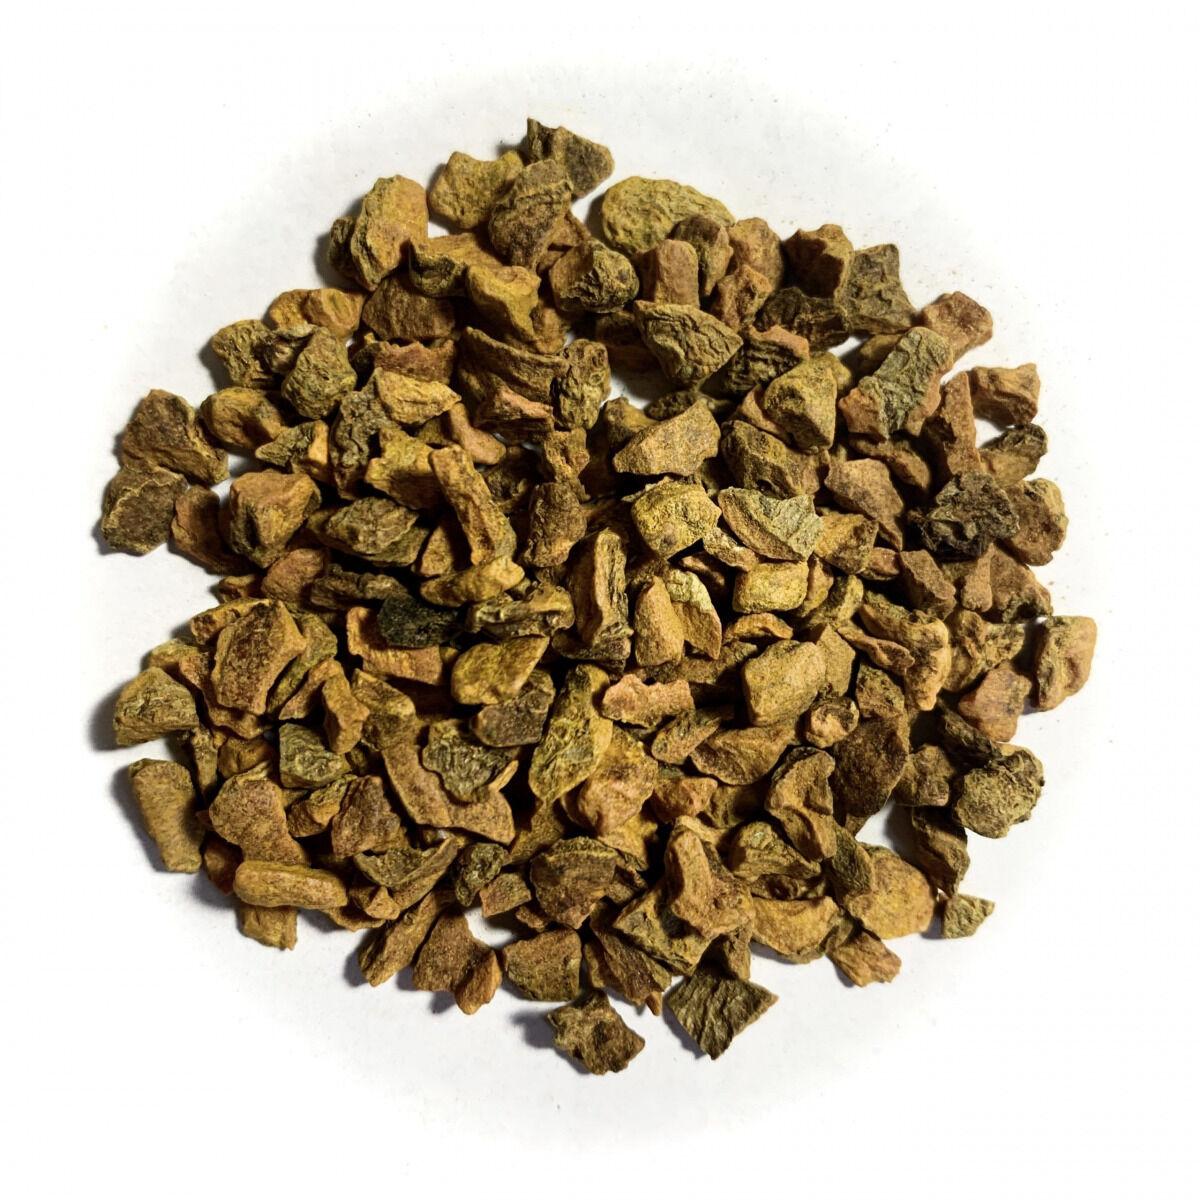 Nuage Sauvage Curcuma Bio En Morceaux (sachet)